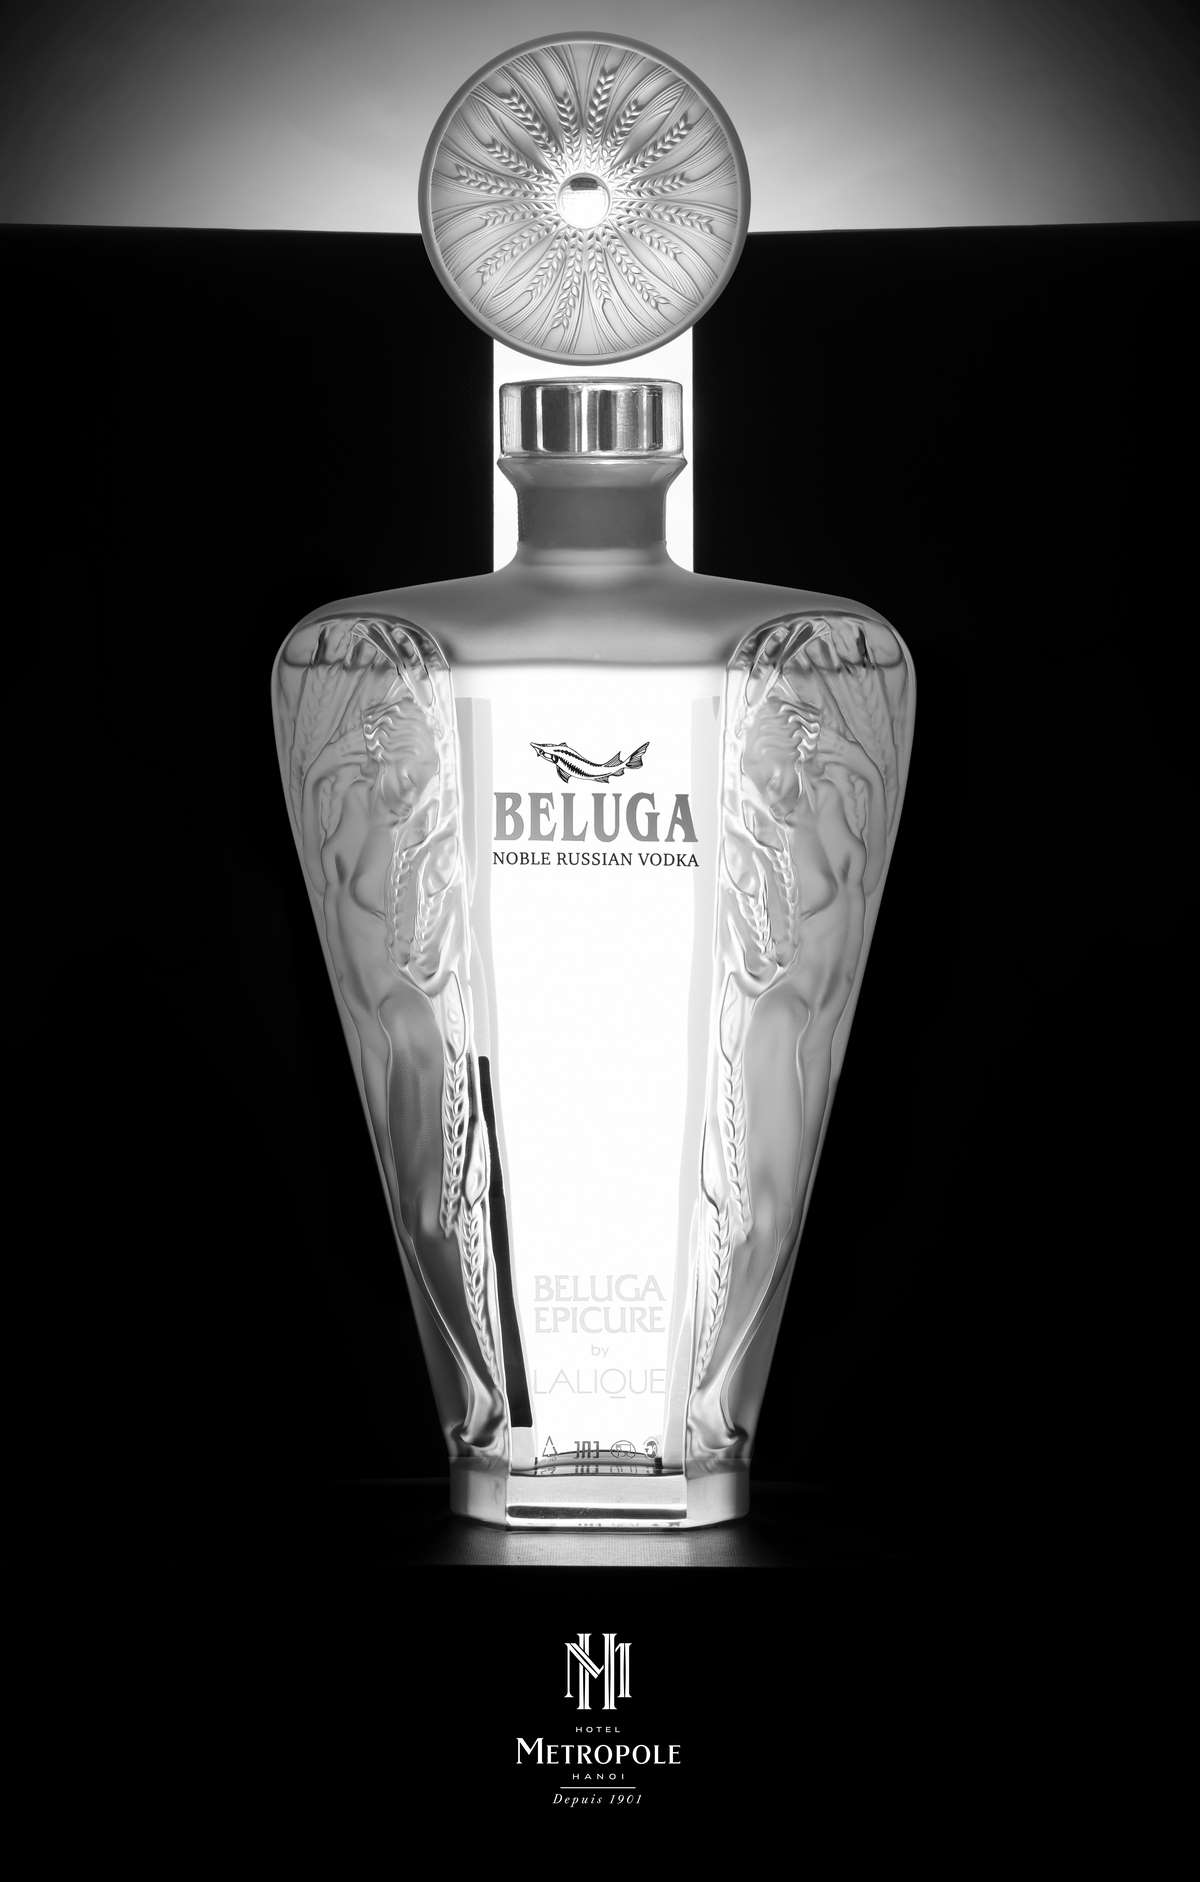 metropole-hanoi-debuts-295m-vnd-bottle-of-beluga-epicure-vodka